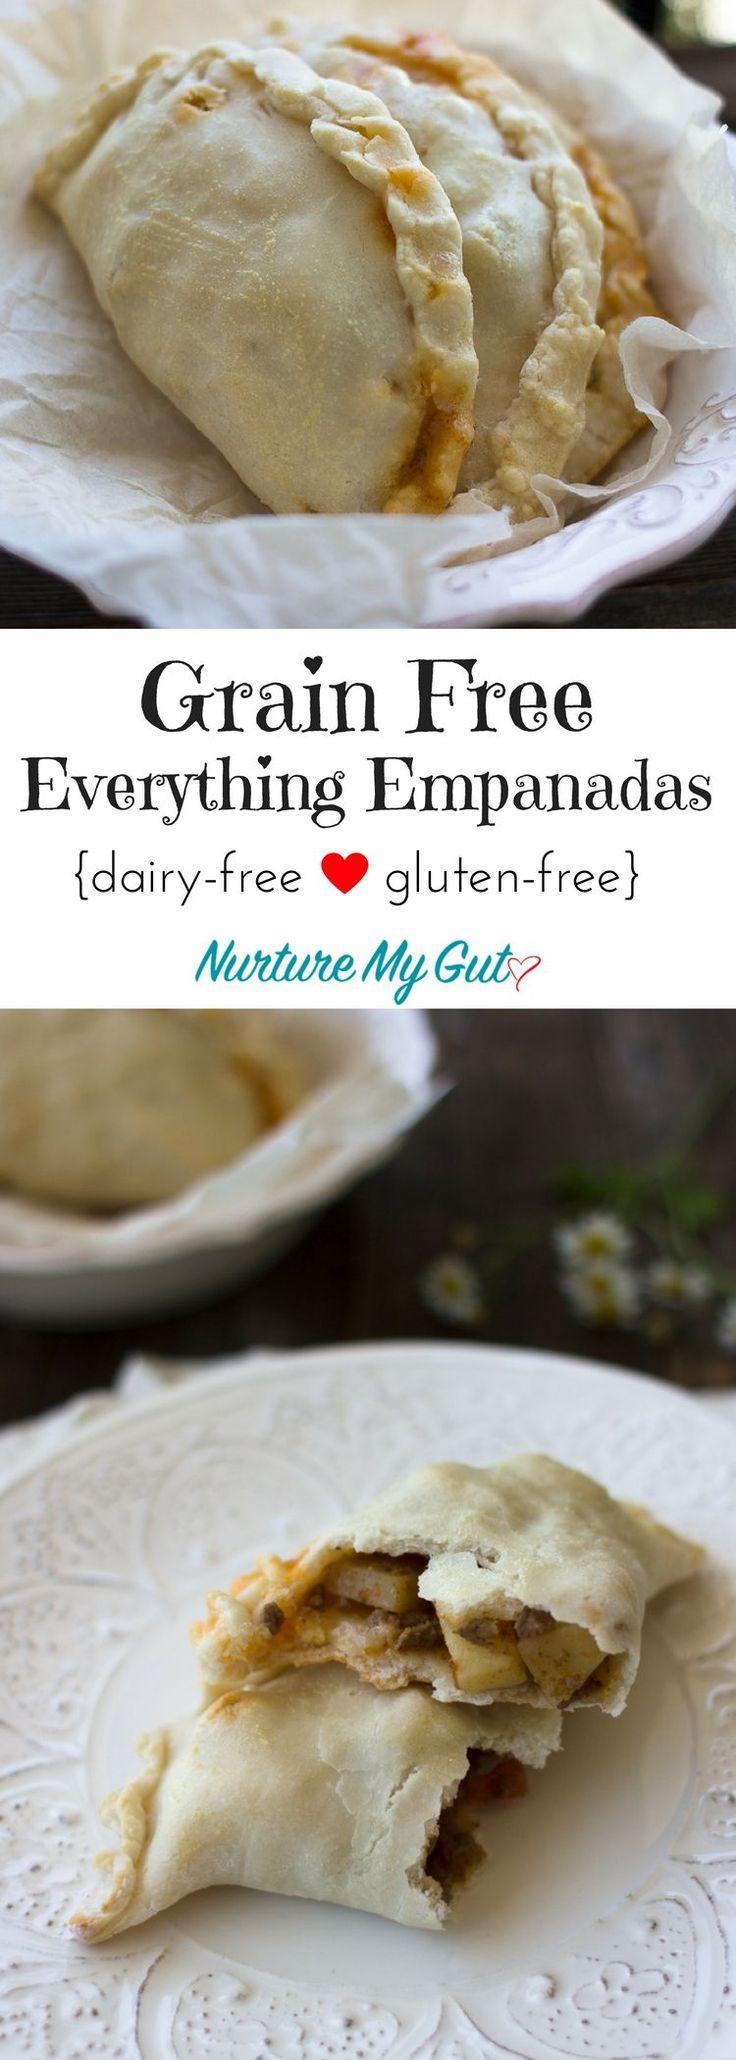 grain free everything empanadas